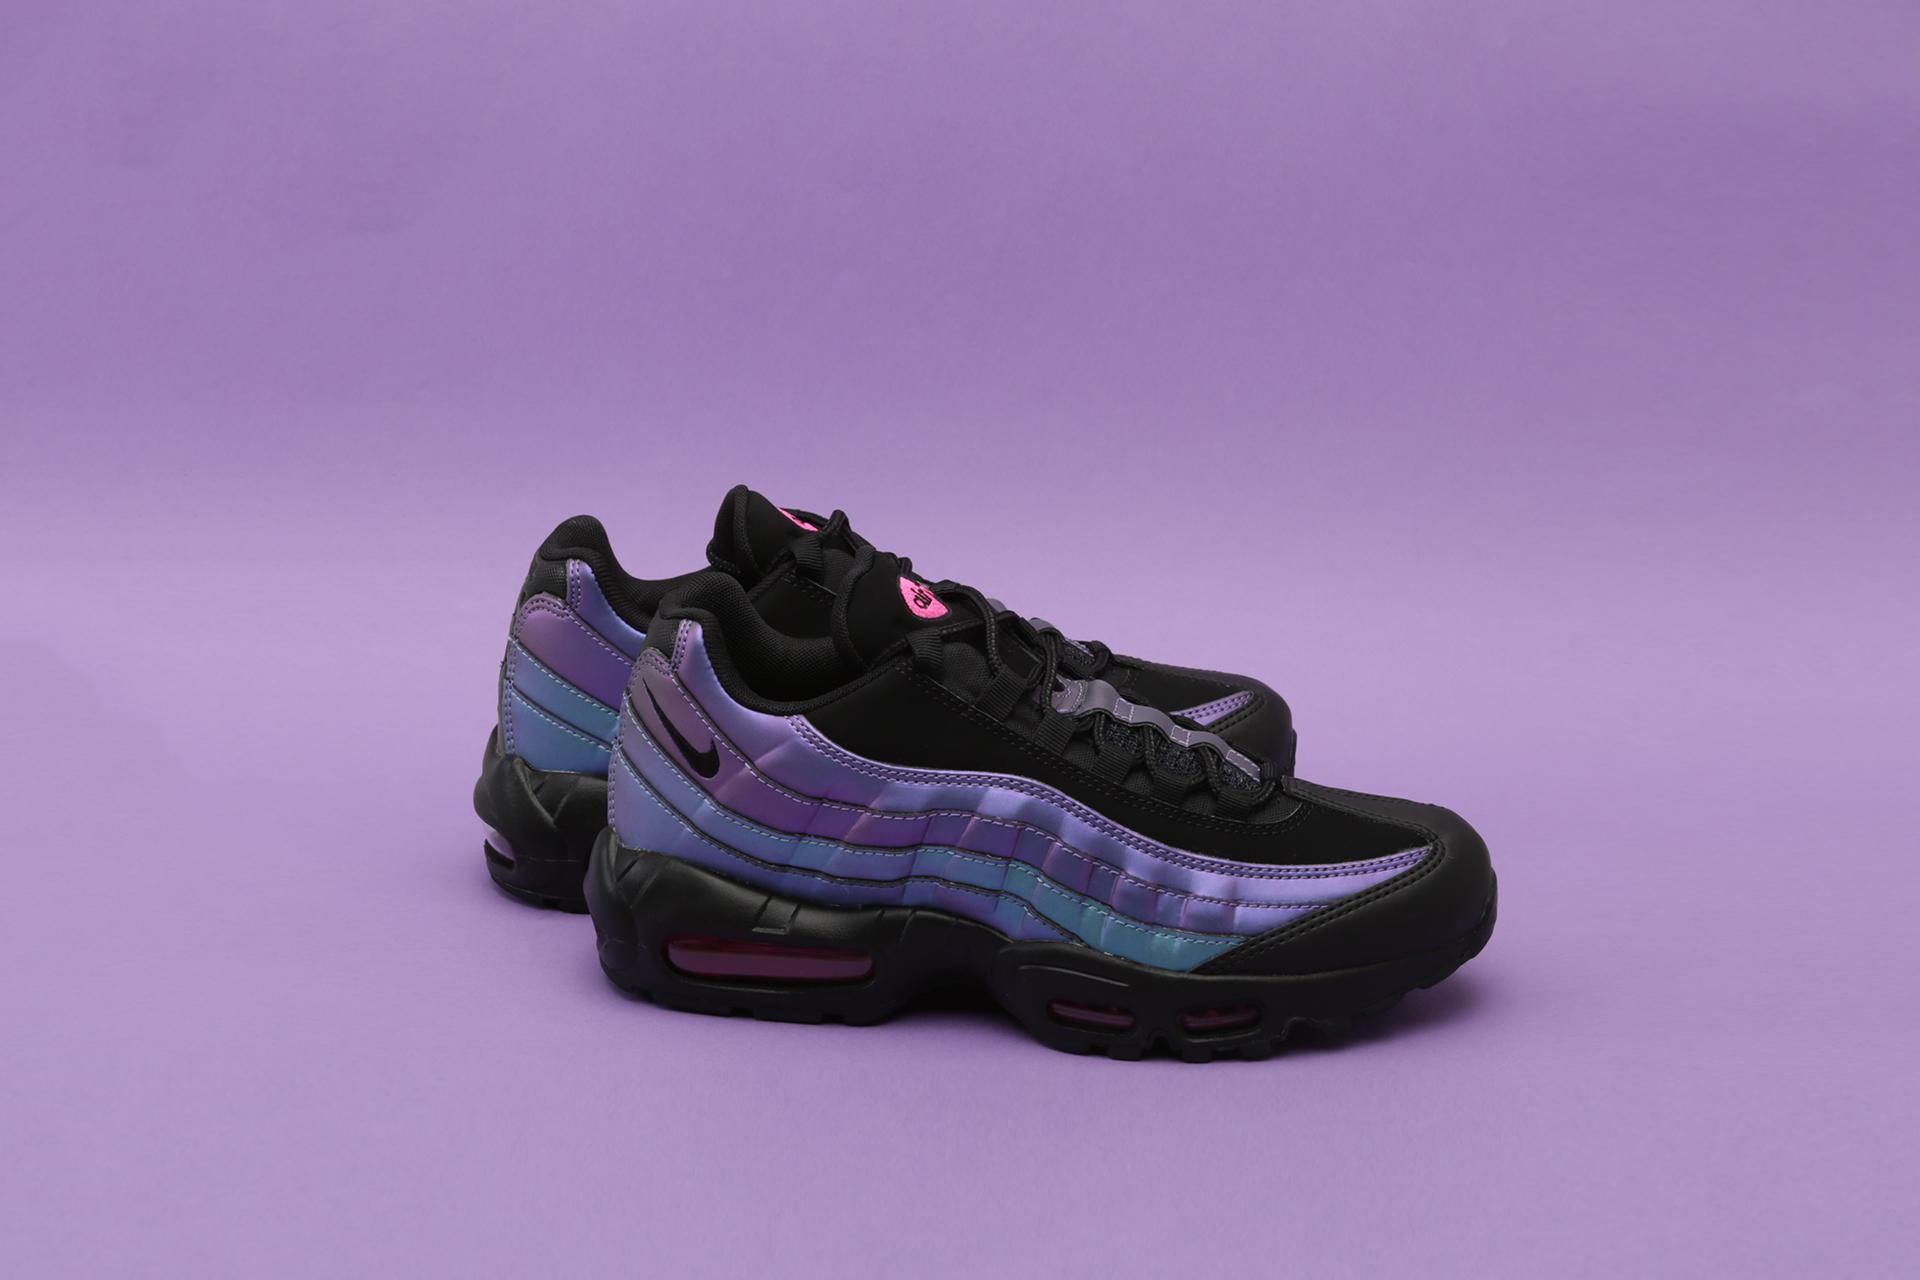 newest fd282 e655a Купить мужские фиолетовые кроссовки Nike Air Max 95 PRM